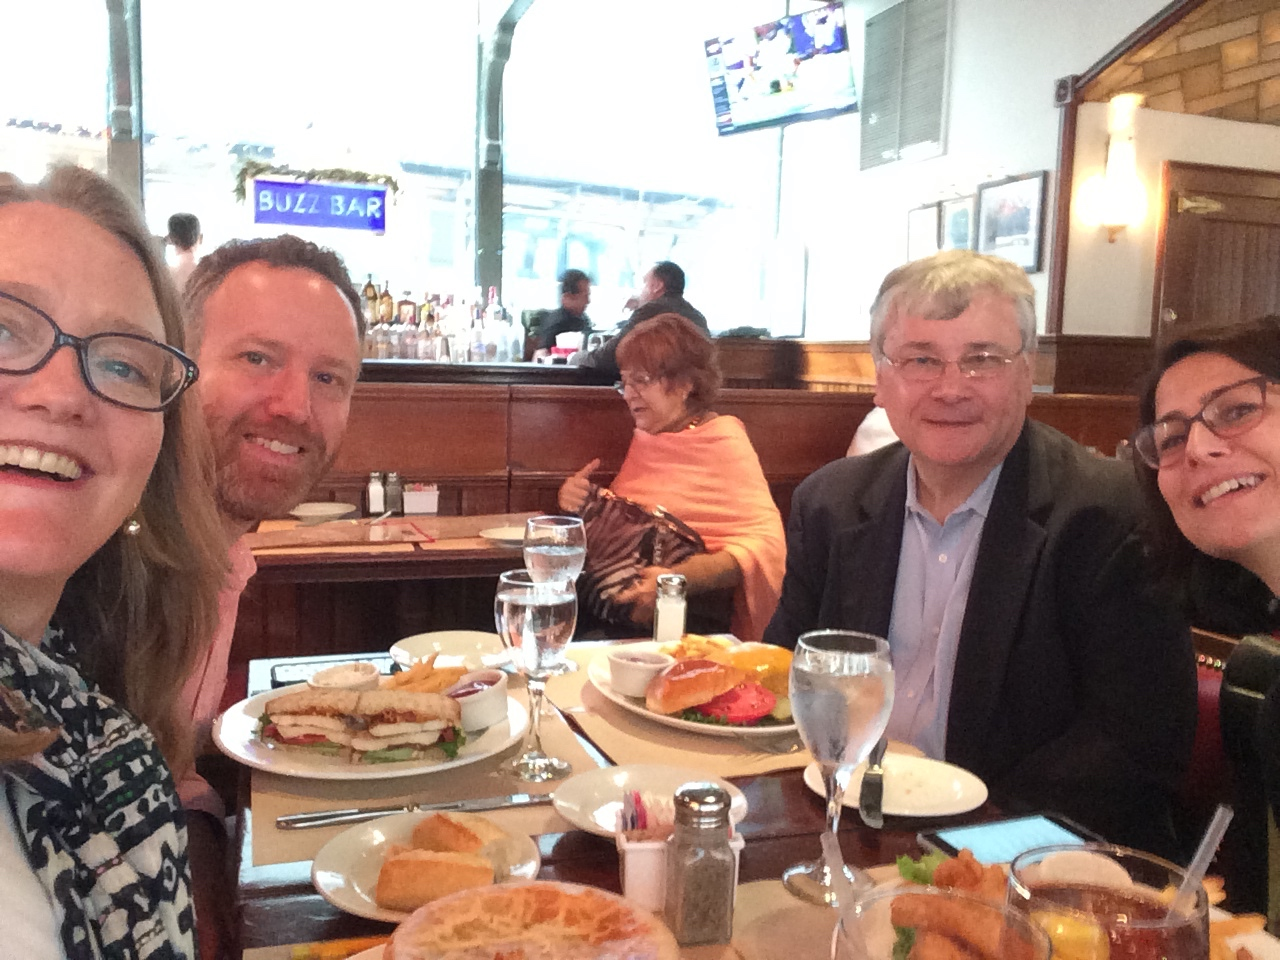 Sarah, me, Frank Totaro, and Deb Shapiro meeting while eating, Dec 2015.